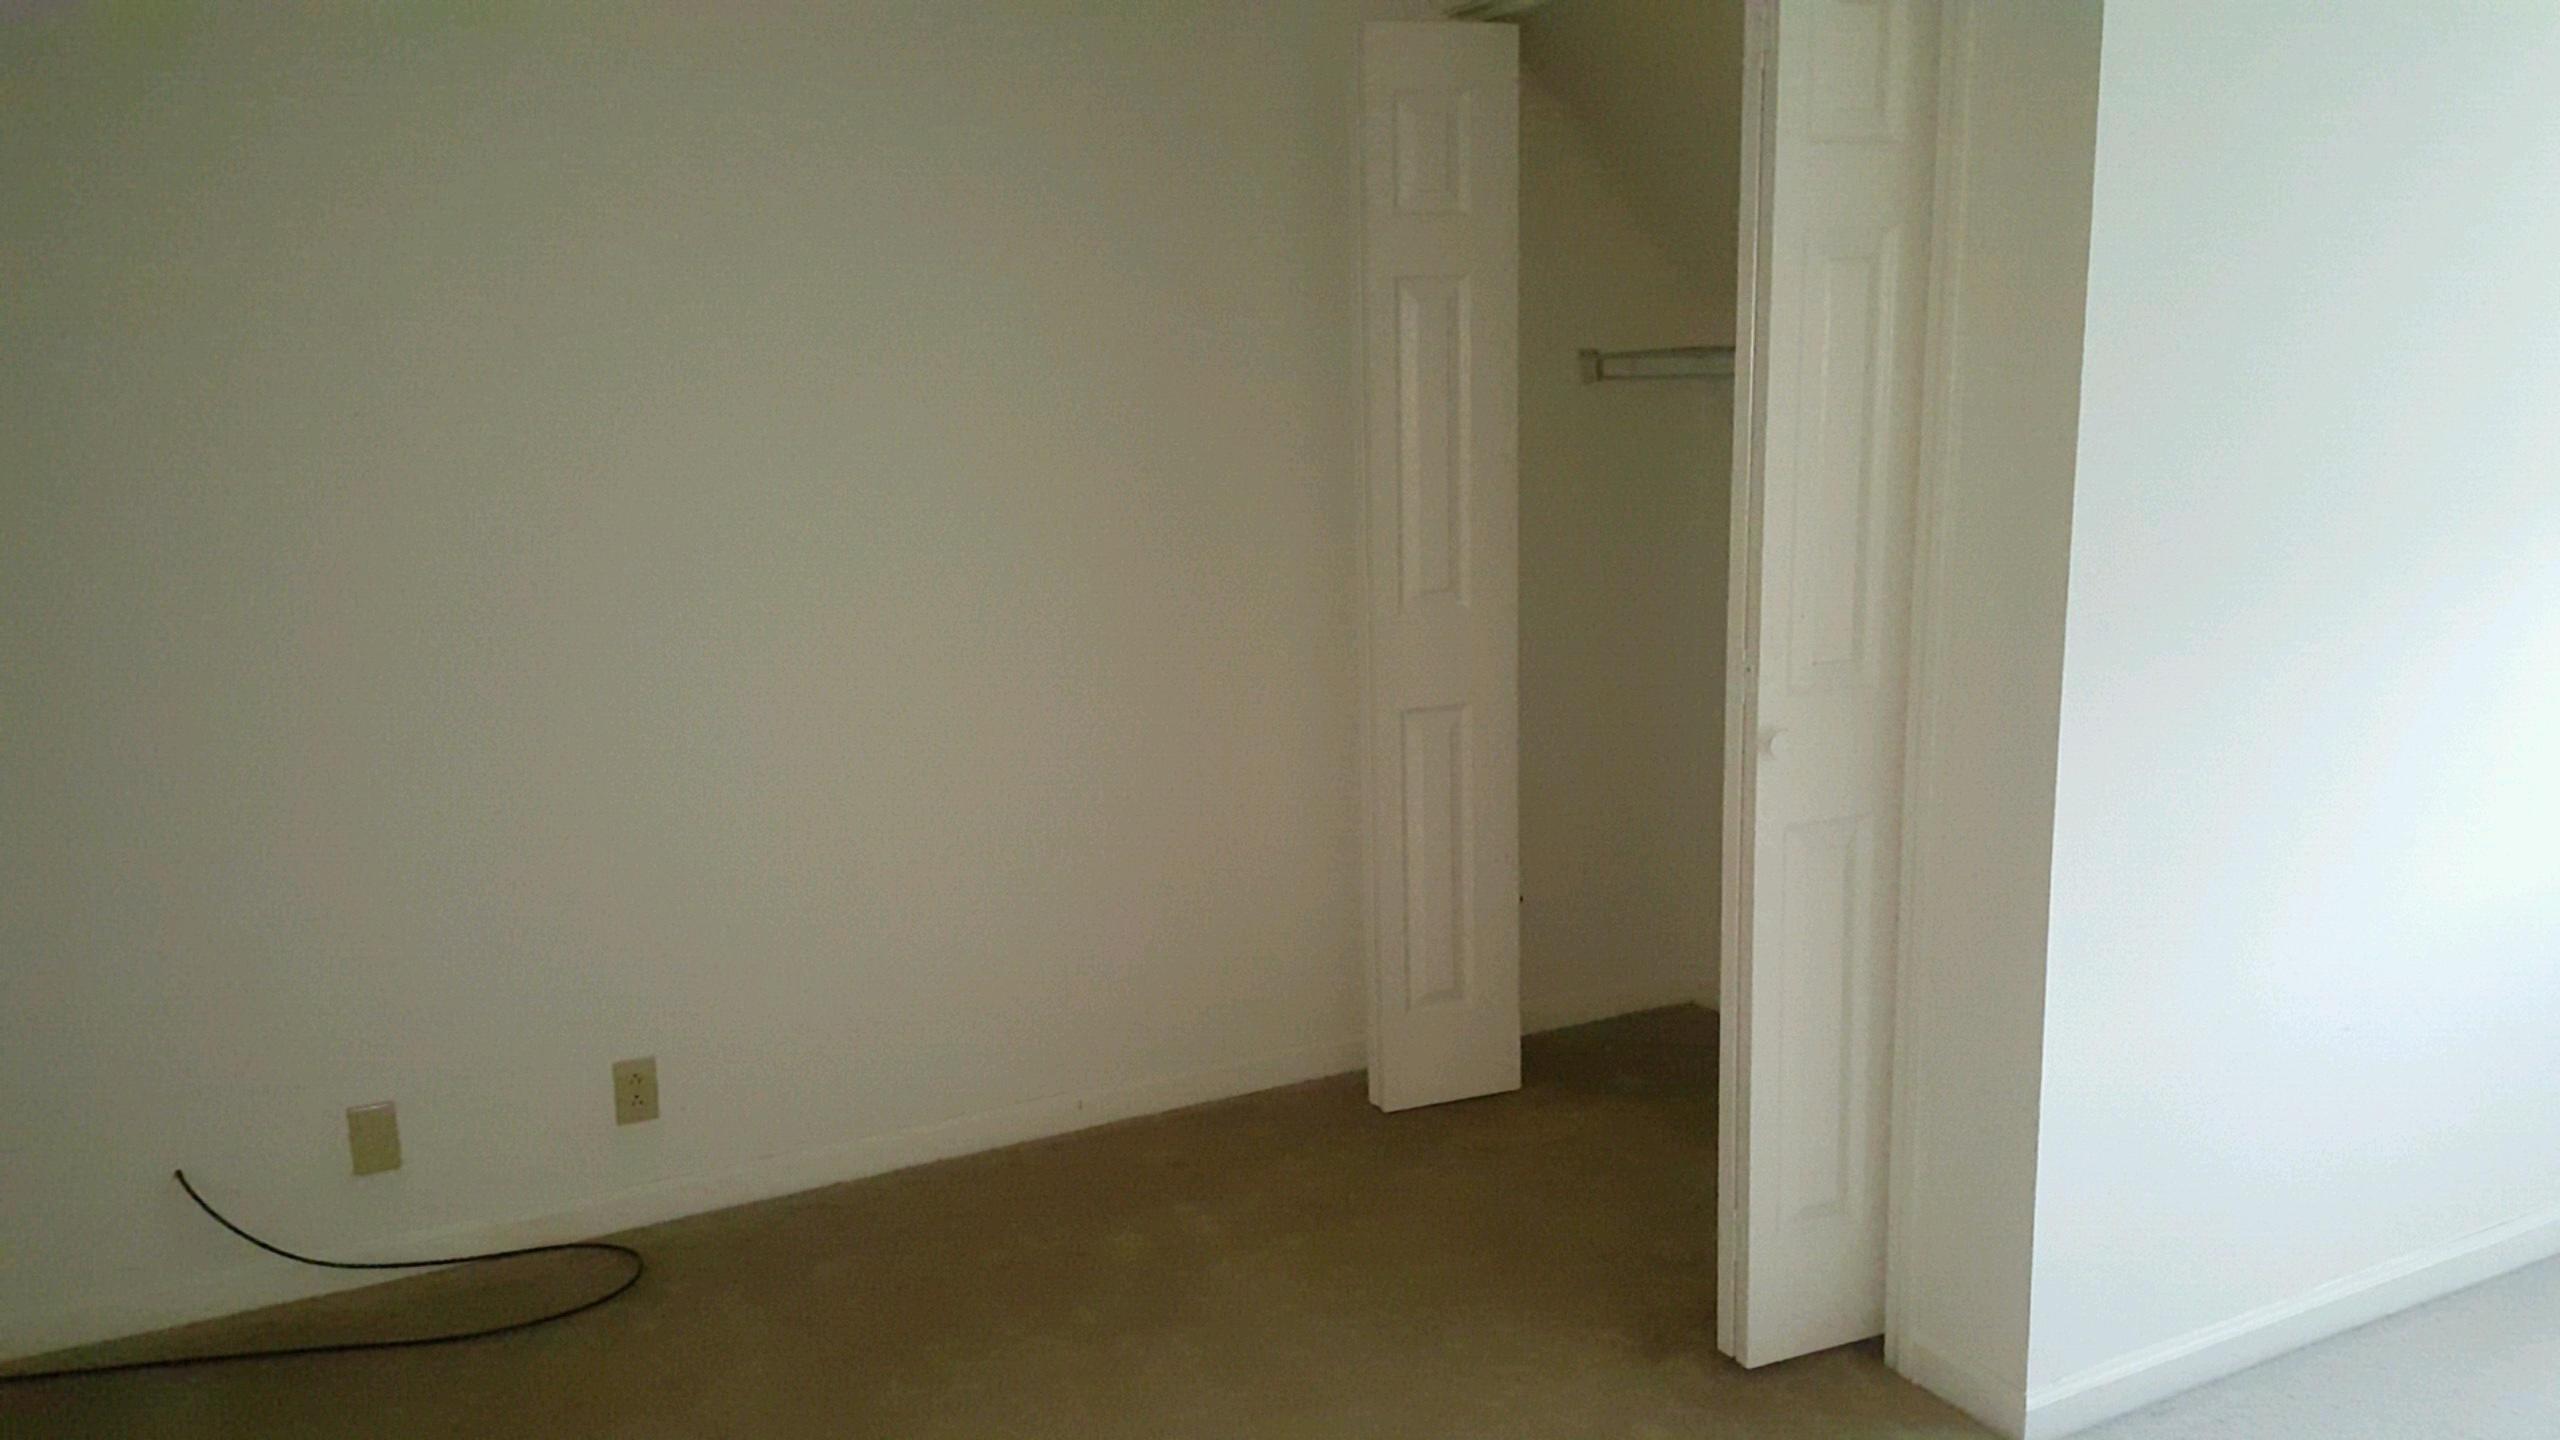 173 Cross Creek, Maynardville, Tennessee, United States 37807, 3 Bedrooms Bedrooms, ,2 BathroomsBathrooms,Single Family,For Sale,Cross Creek,1002278